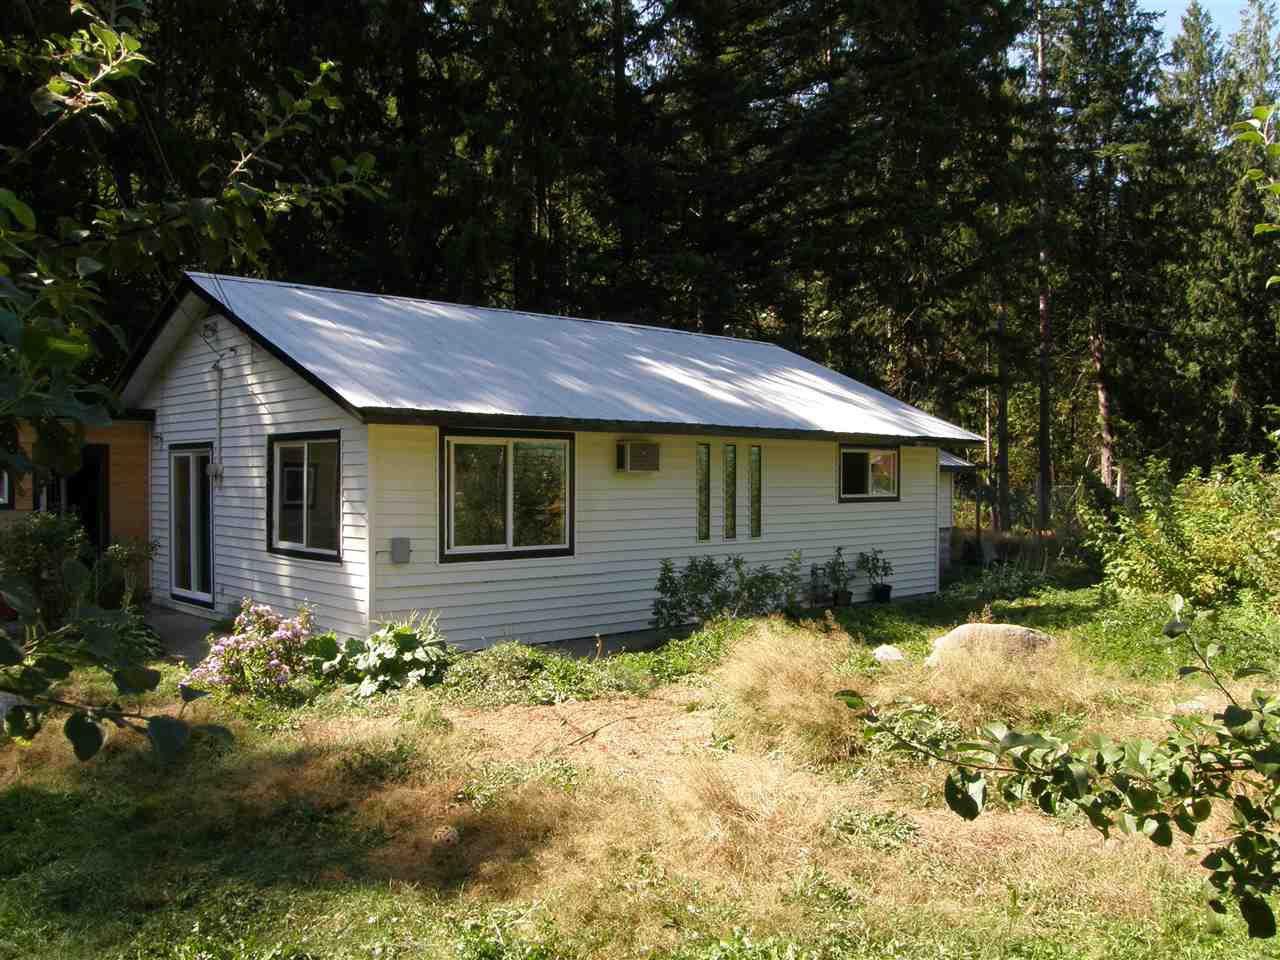 Main Photo: 19749 SILVERHOPE Road in Hope: Hope Silver Creek House for sale : MLS®# R2488247